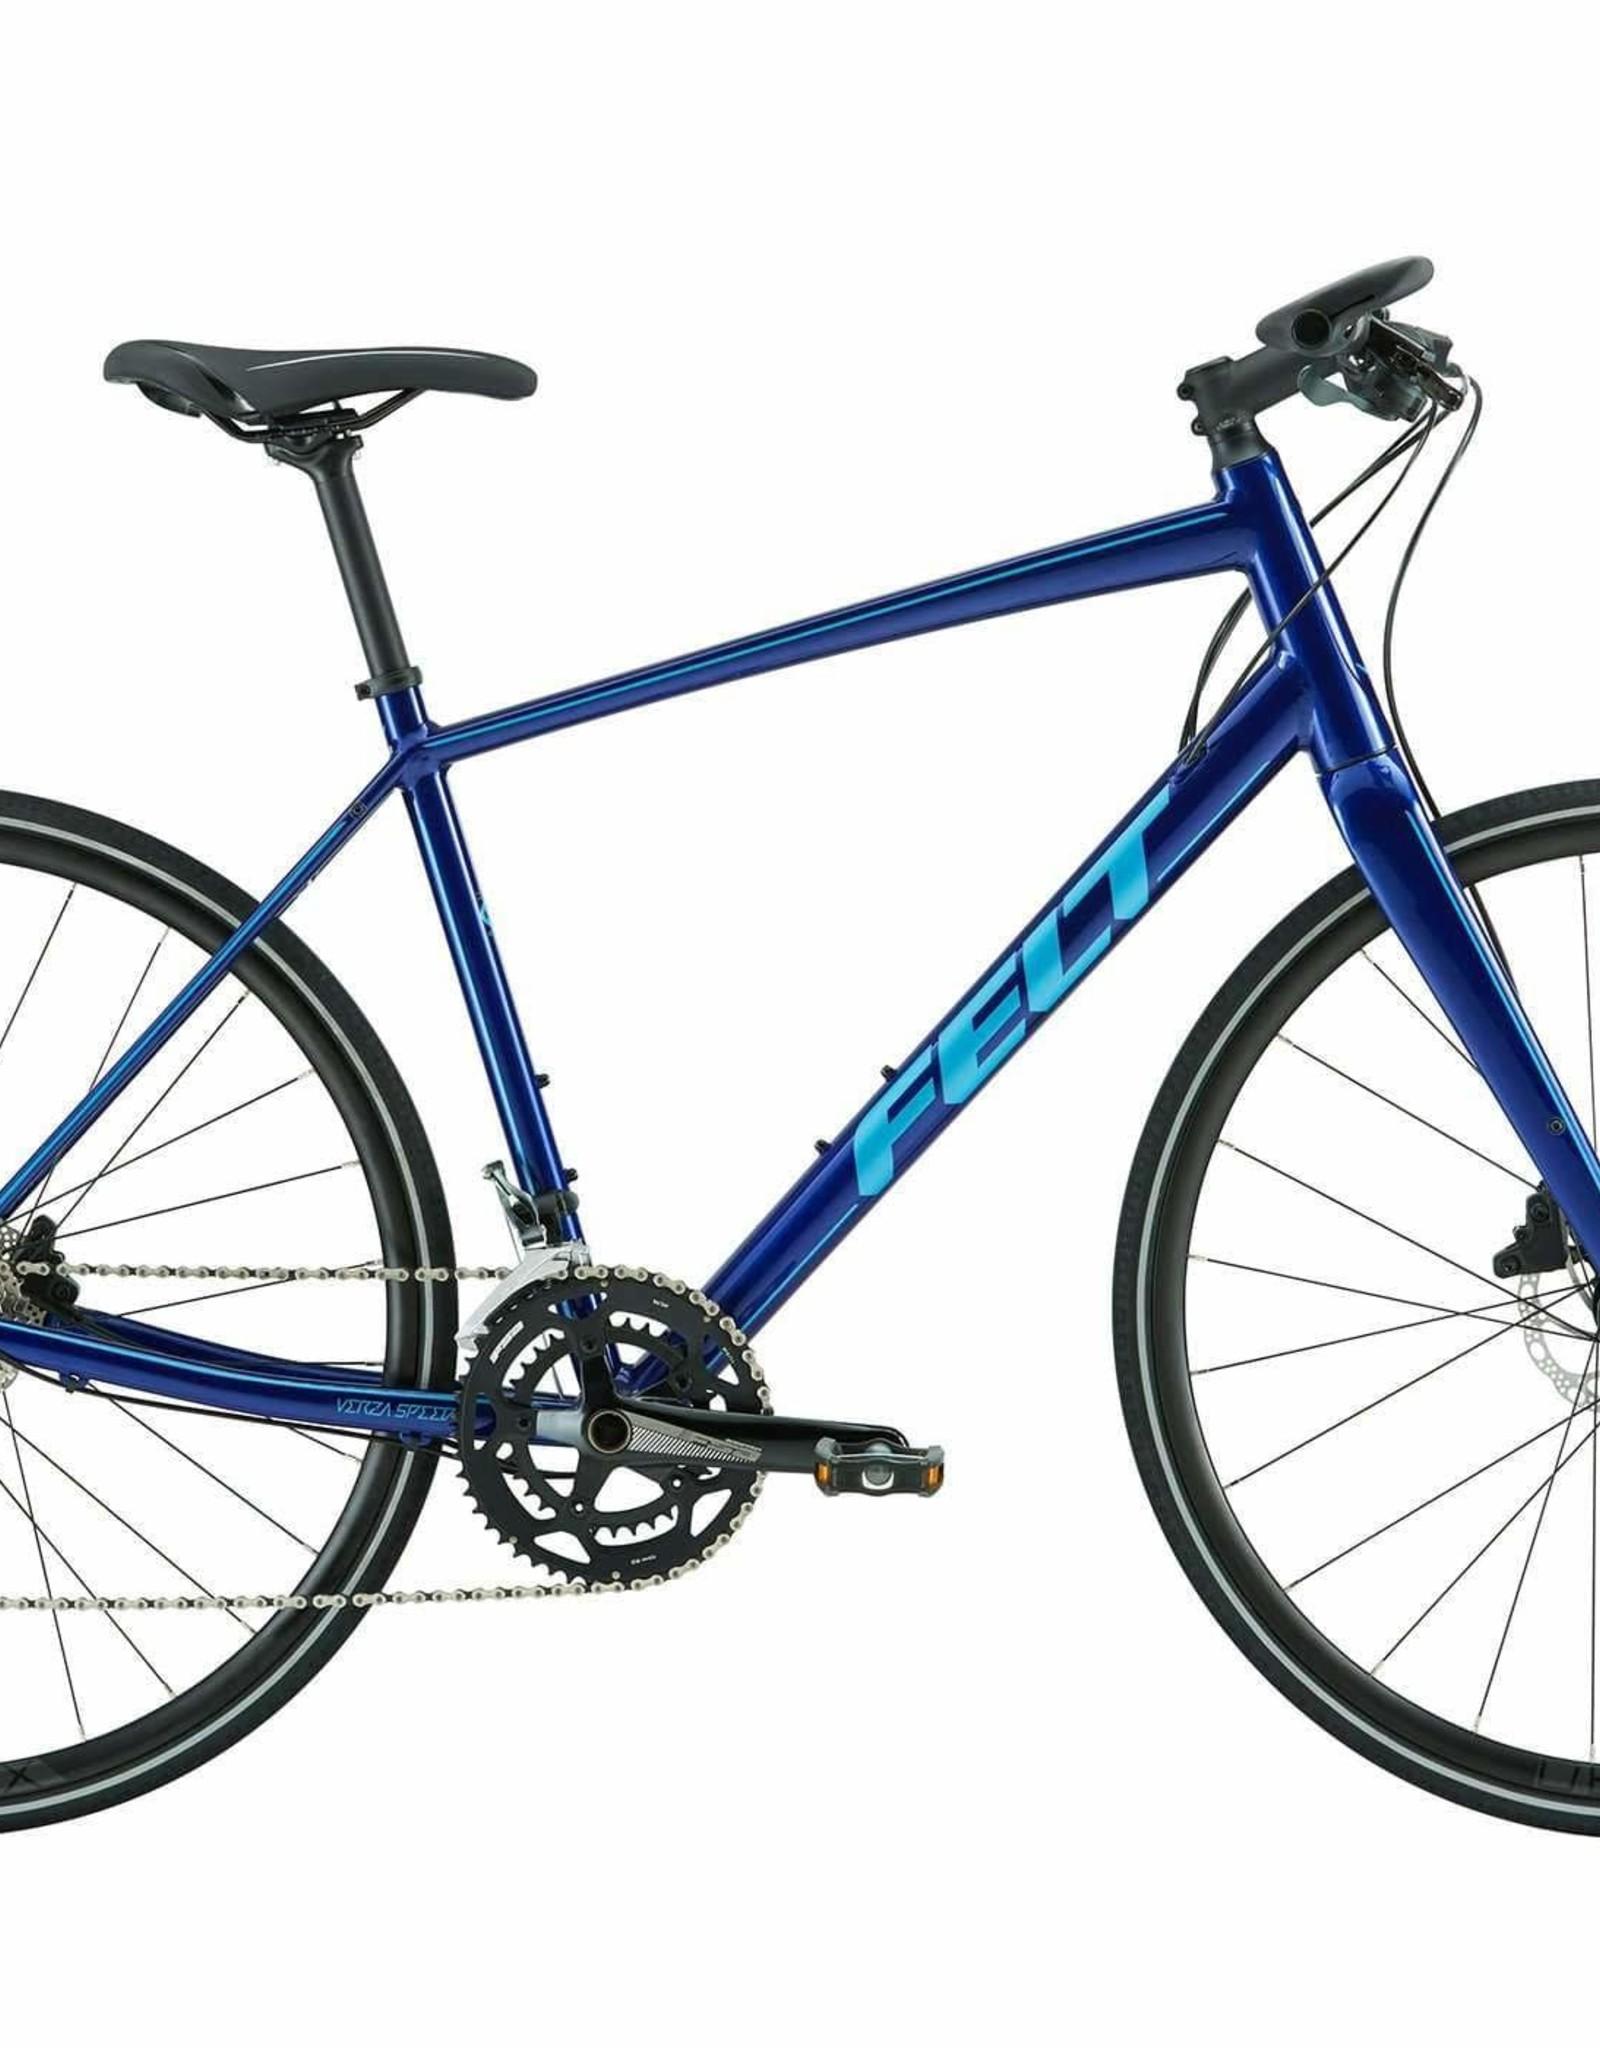 Felt Verza Speed 20 Midnight Blue (Reflective Aquafresh) XL